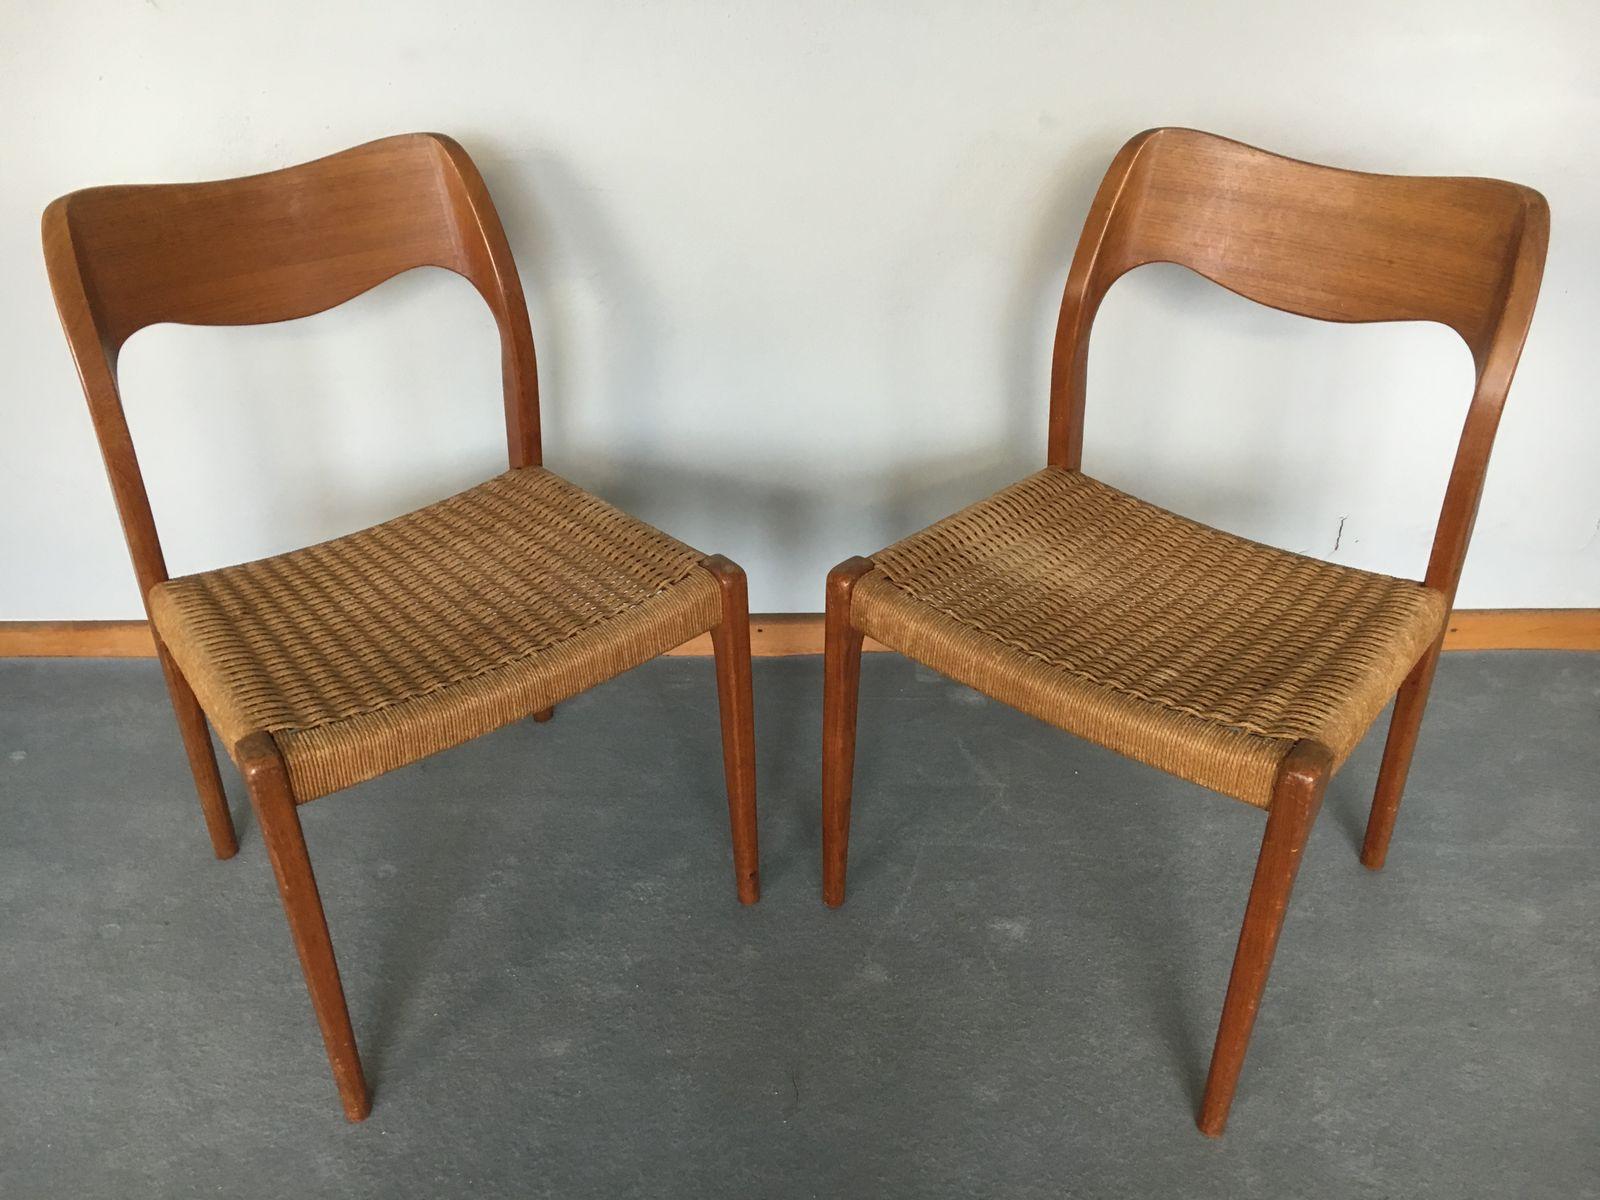 Model 71 Dining Chairs By Niels O. Møller For J.L. Møller, 1960s, Set Of 4